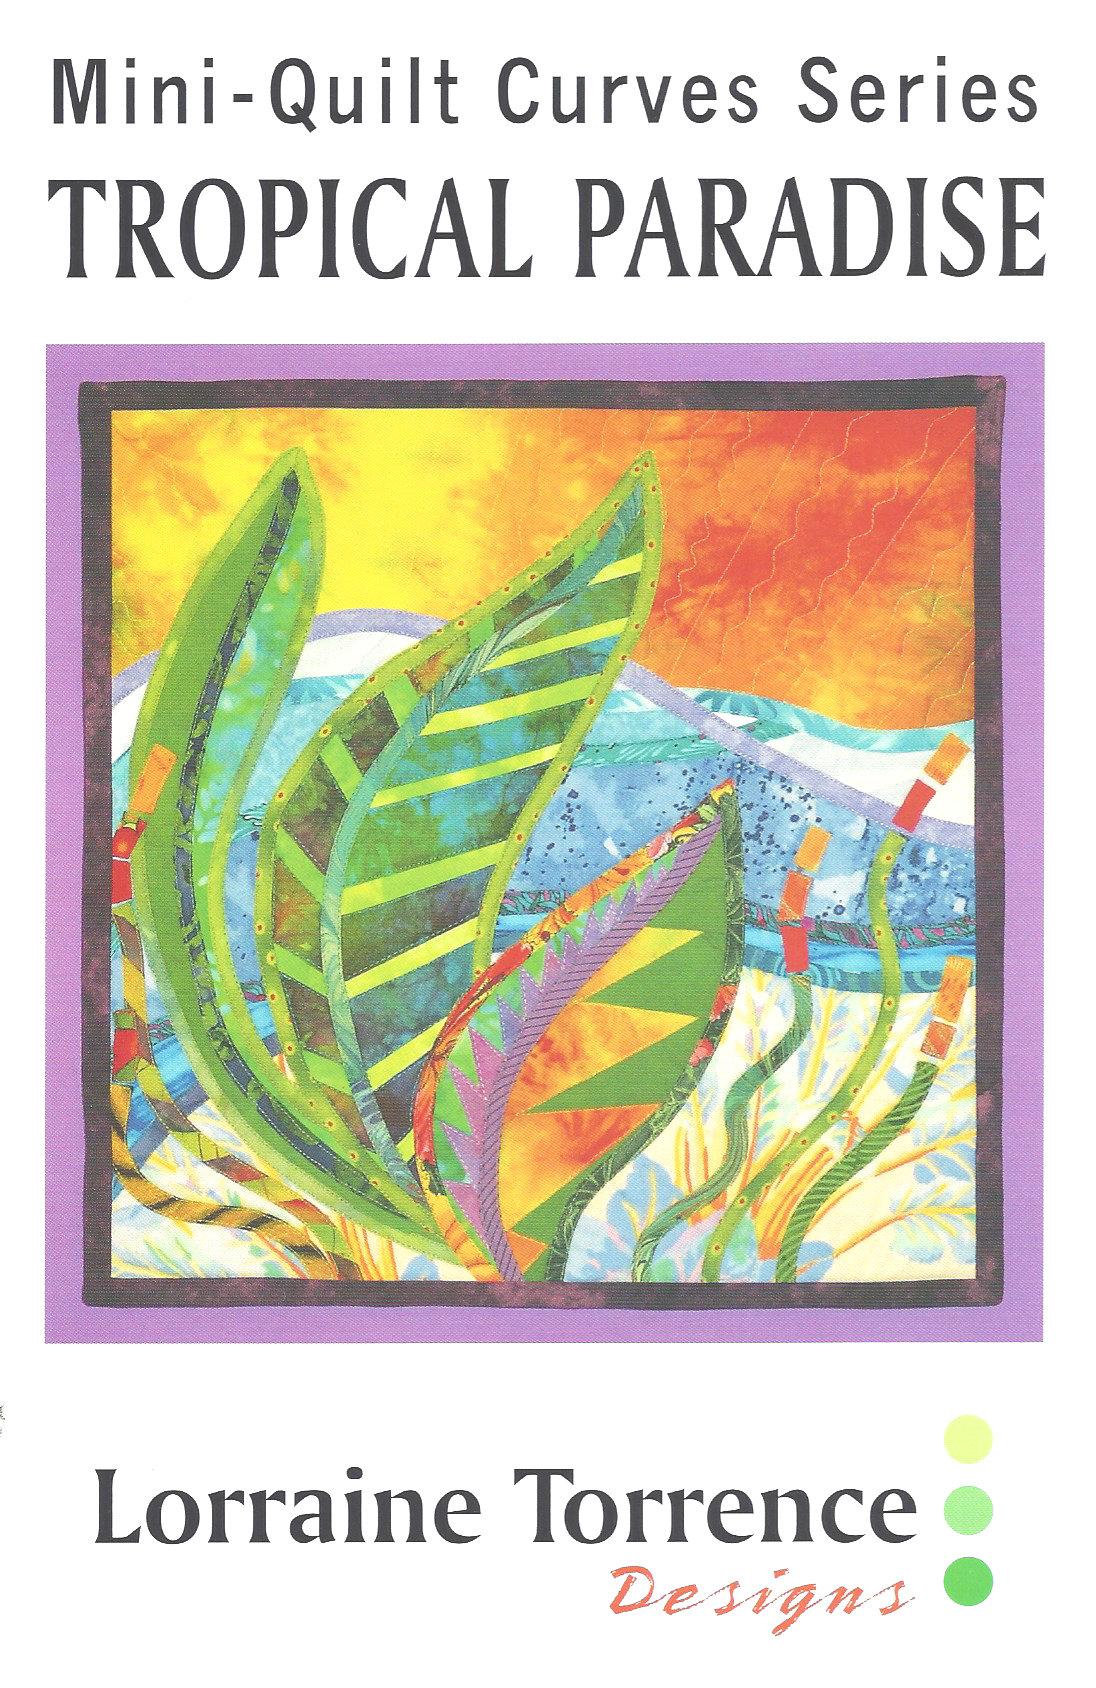 Mini-Quilt Curves Series: Tropical Paradise